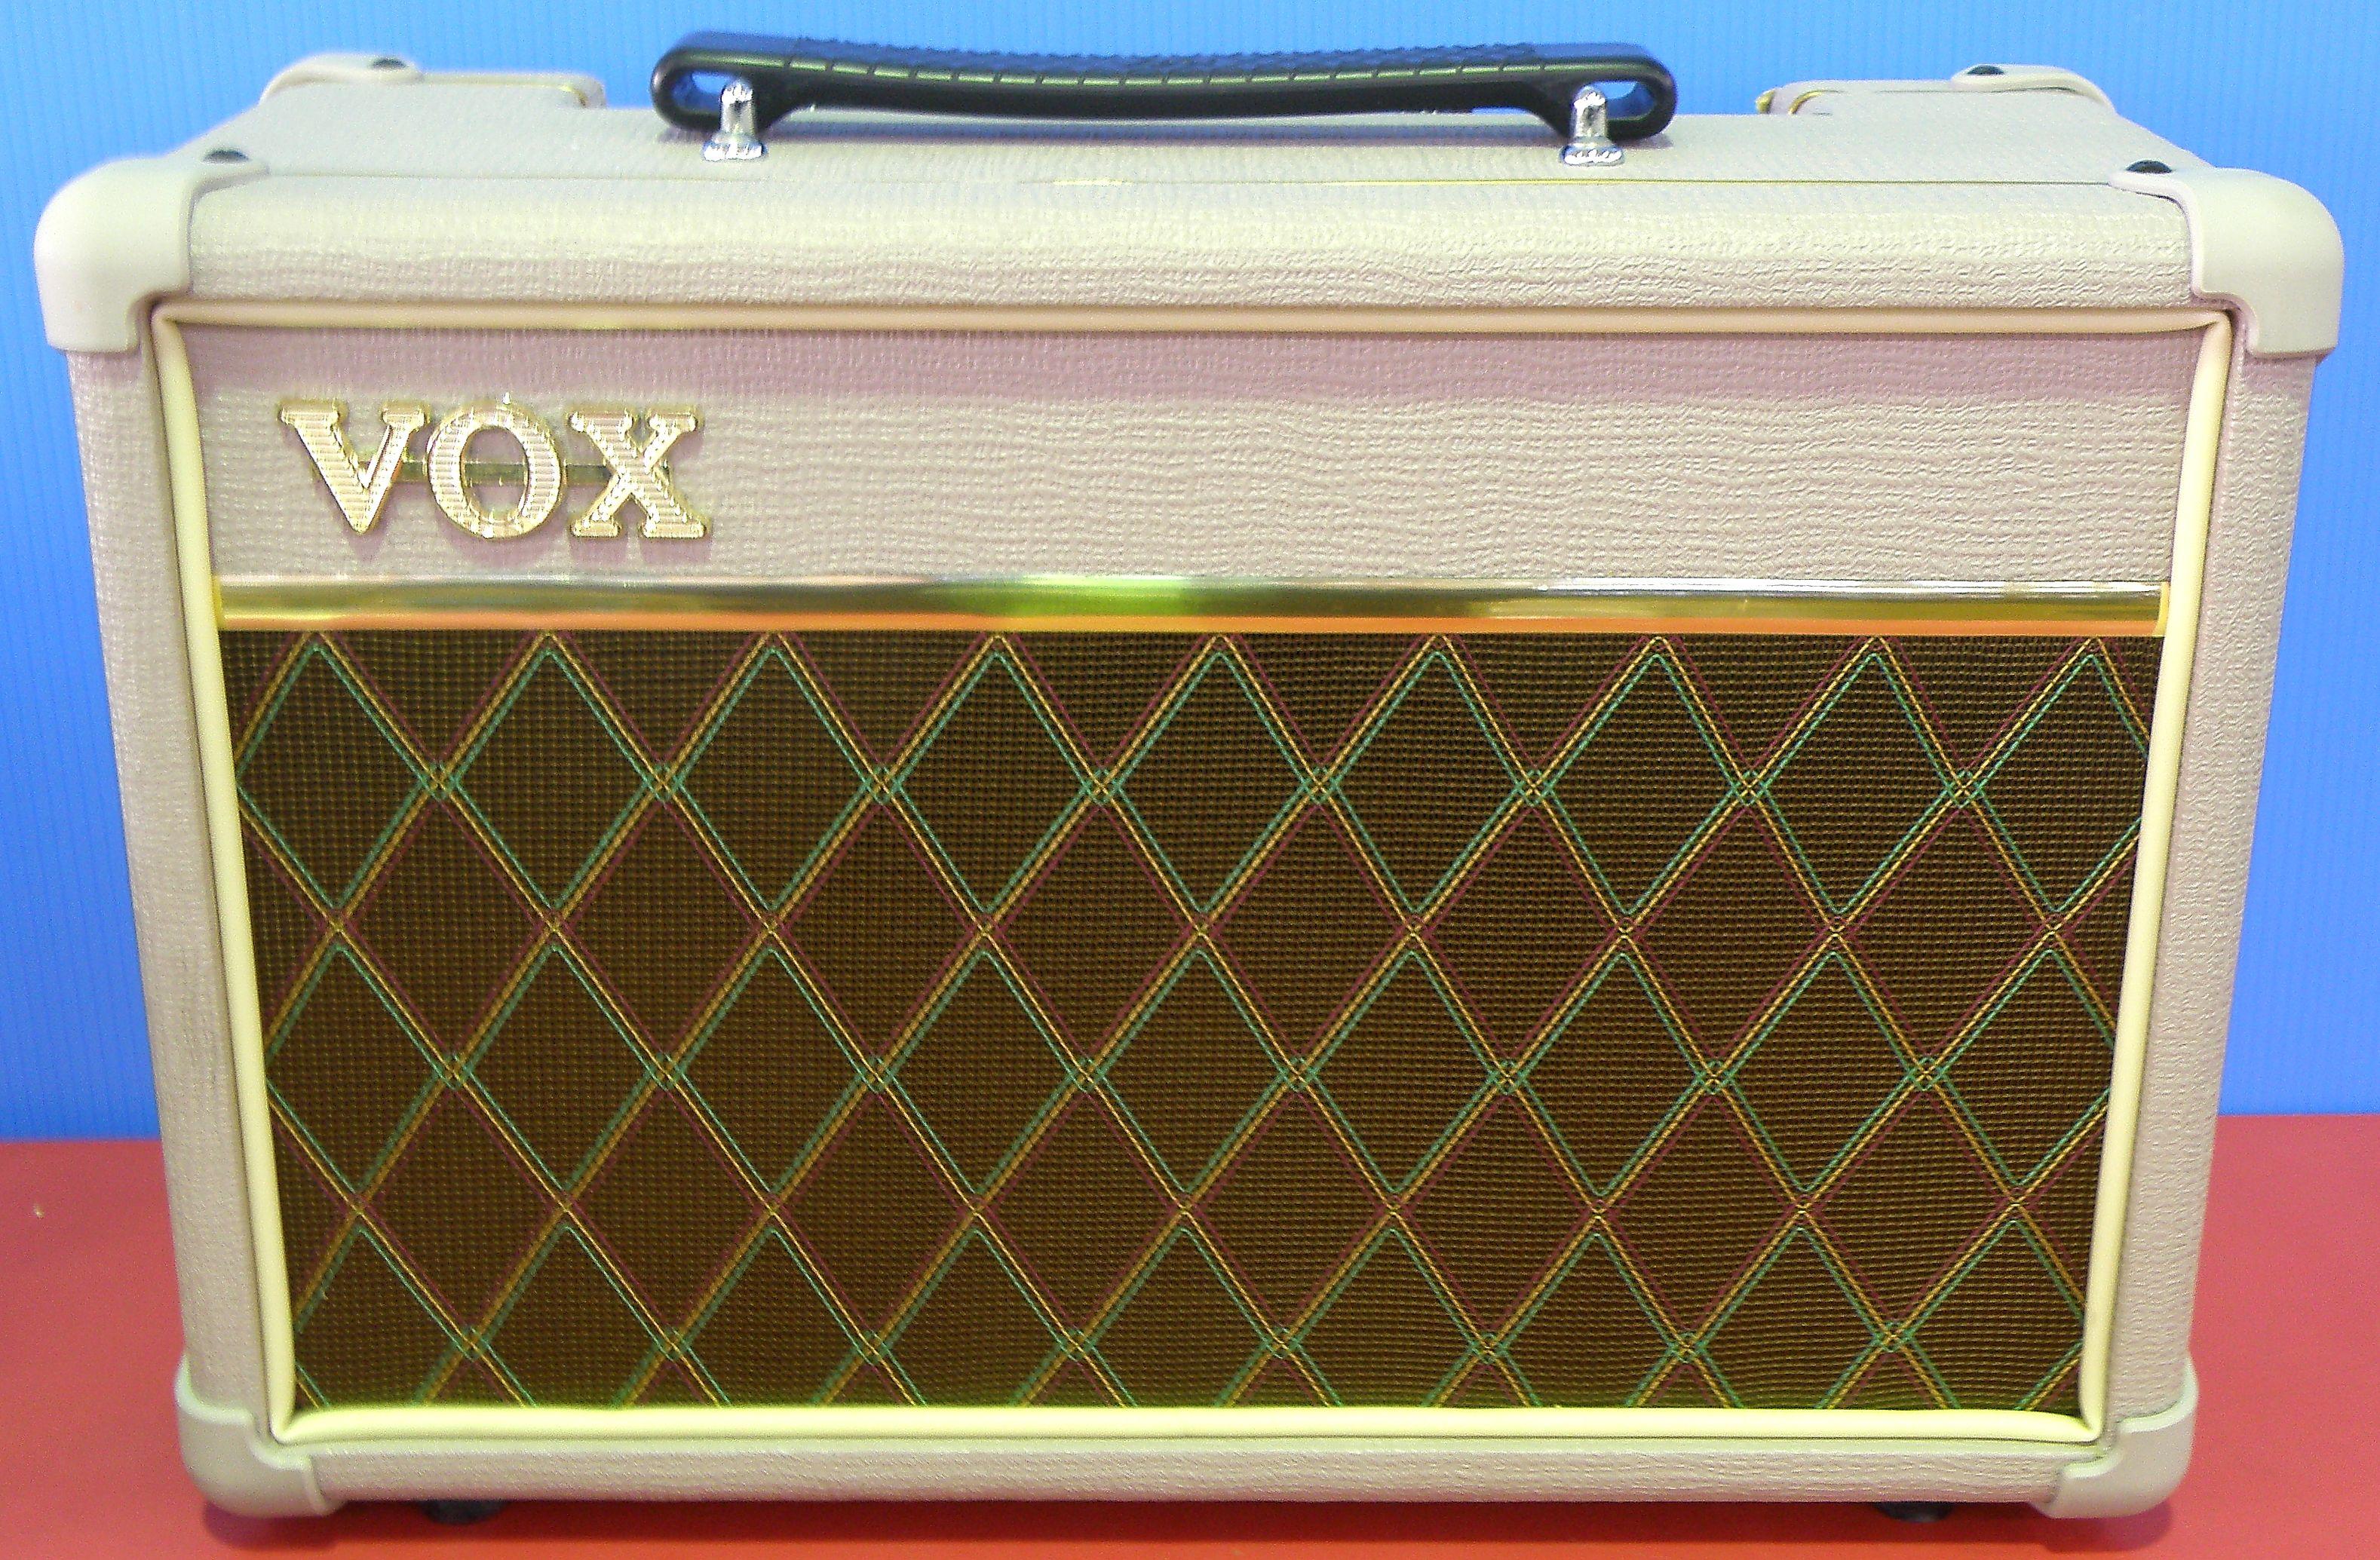 VOX ギターアンプ Pathfinger10